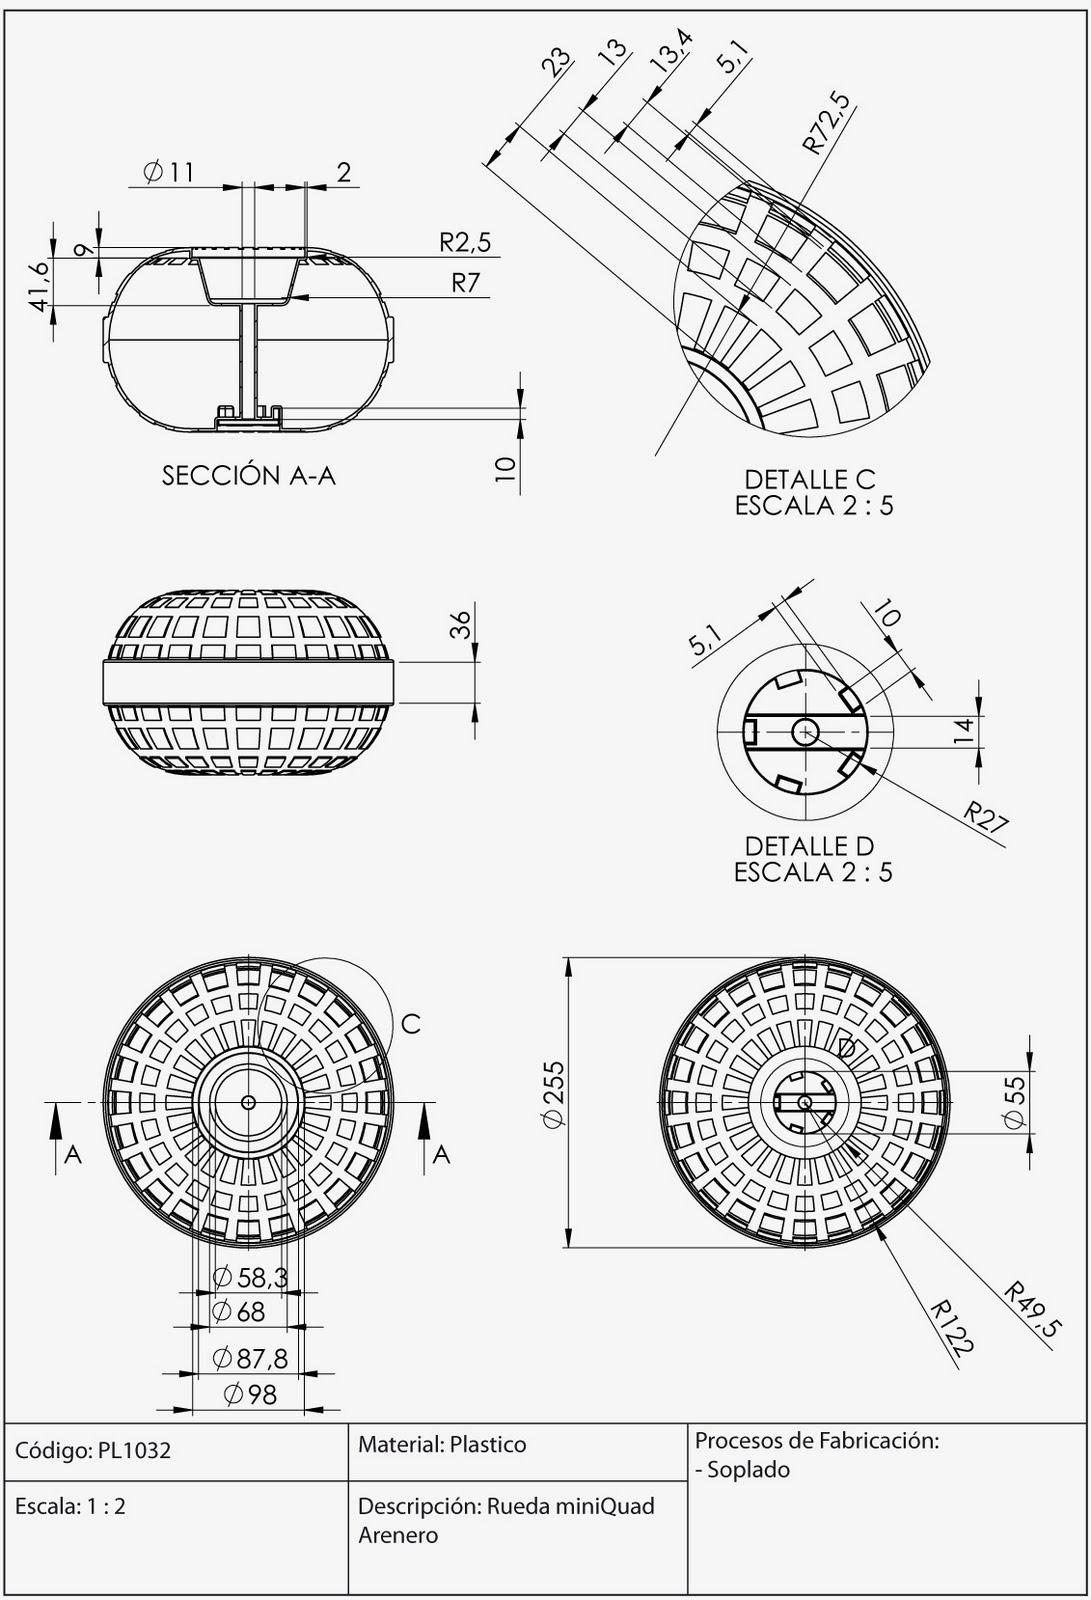 Design 'n' Stuff